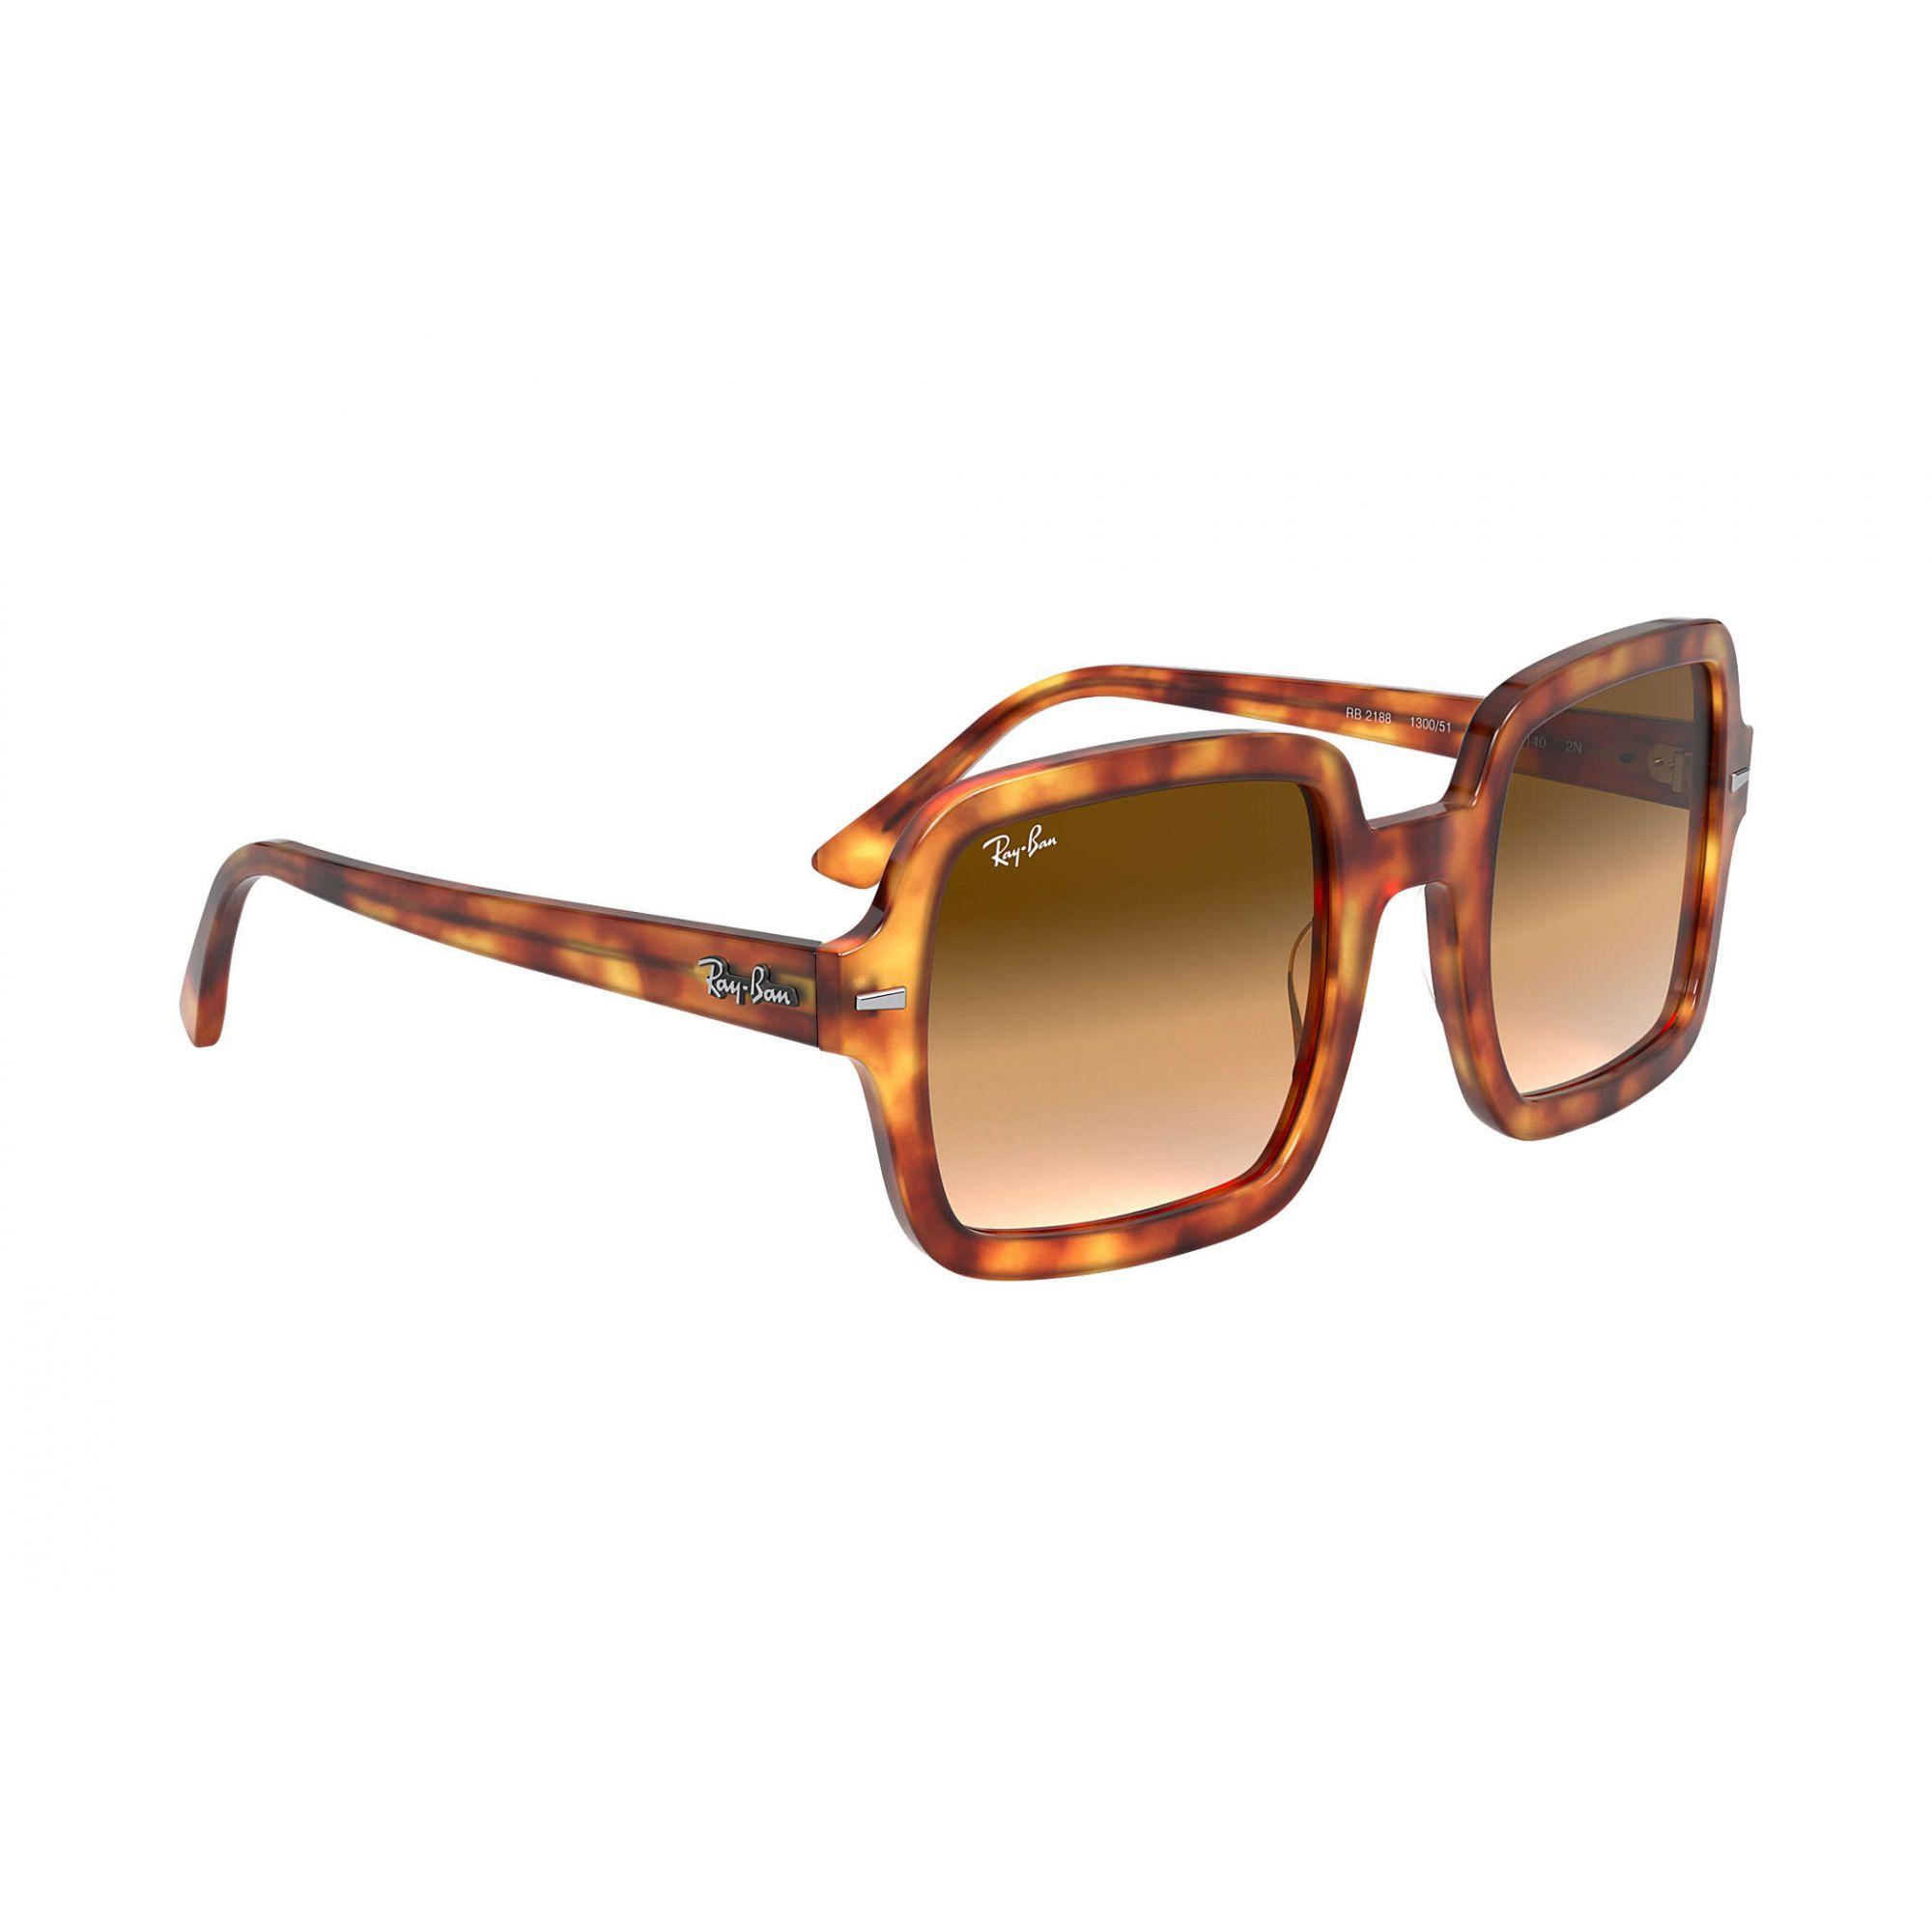 Óculos de Sol Feminino Ray-Ban RB2188 Tartaruga Claro